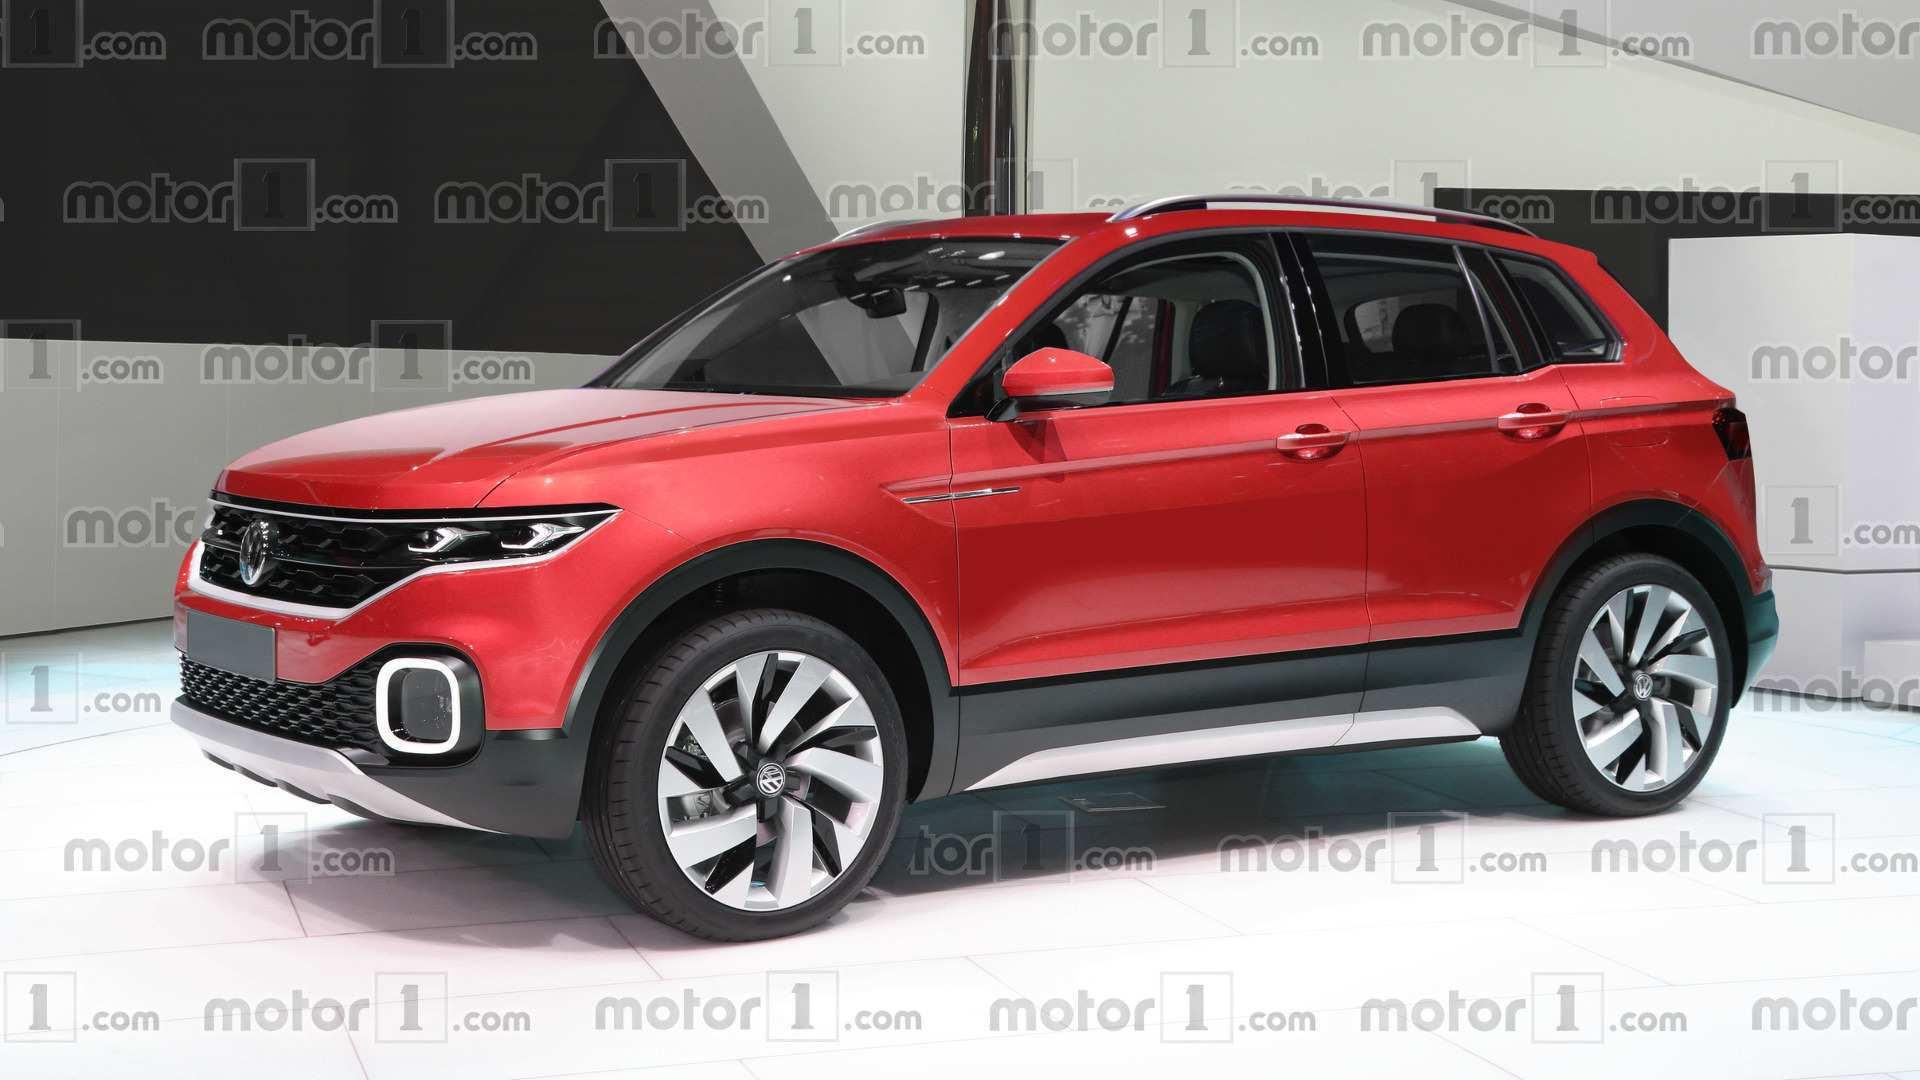 40 New Lançamento Volkswagen 2020 Pictures by Lançamento Volkswagen 2020